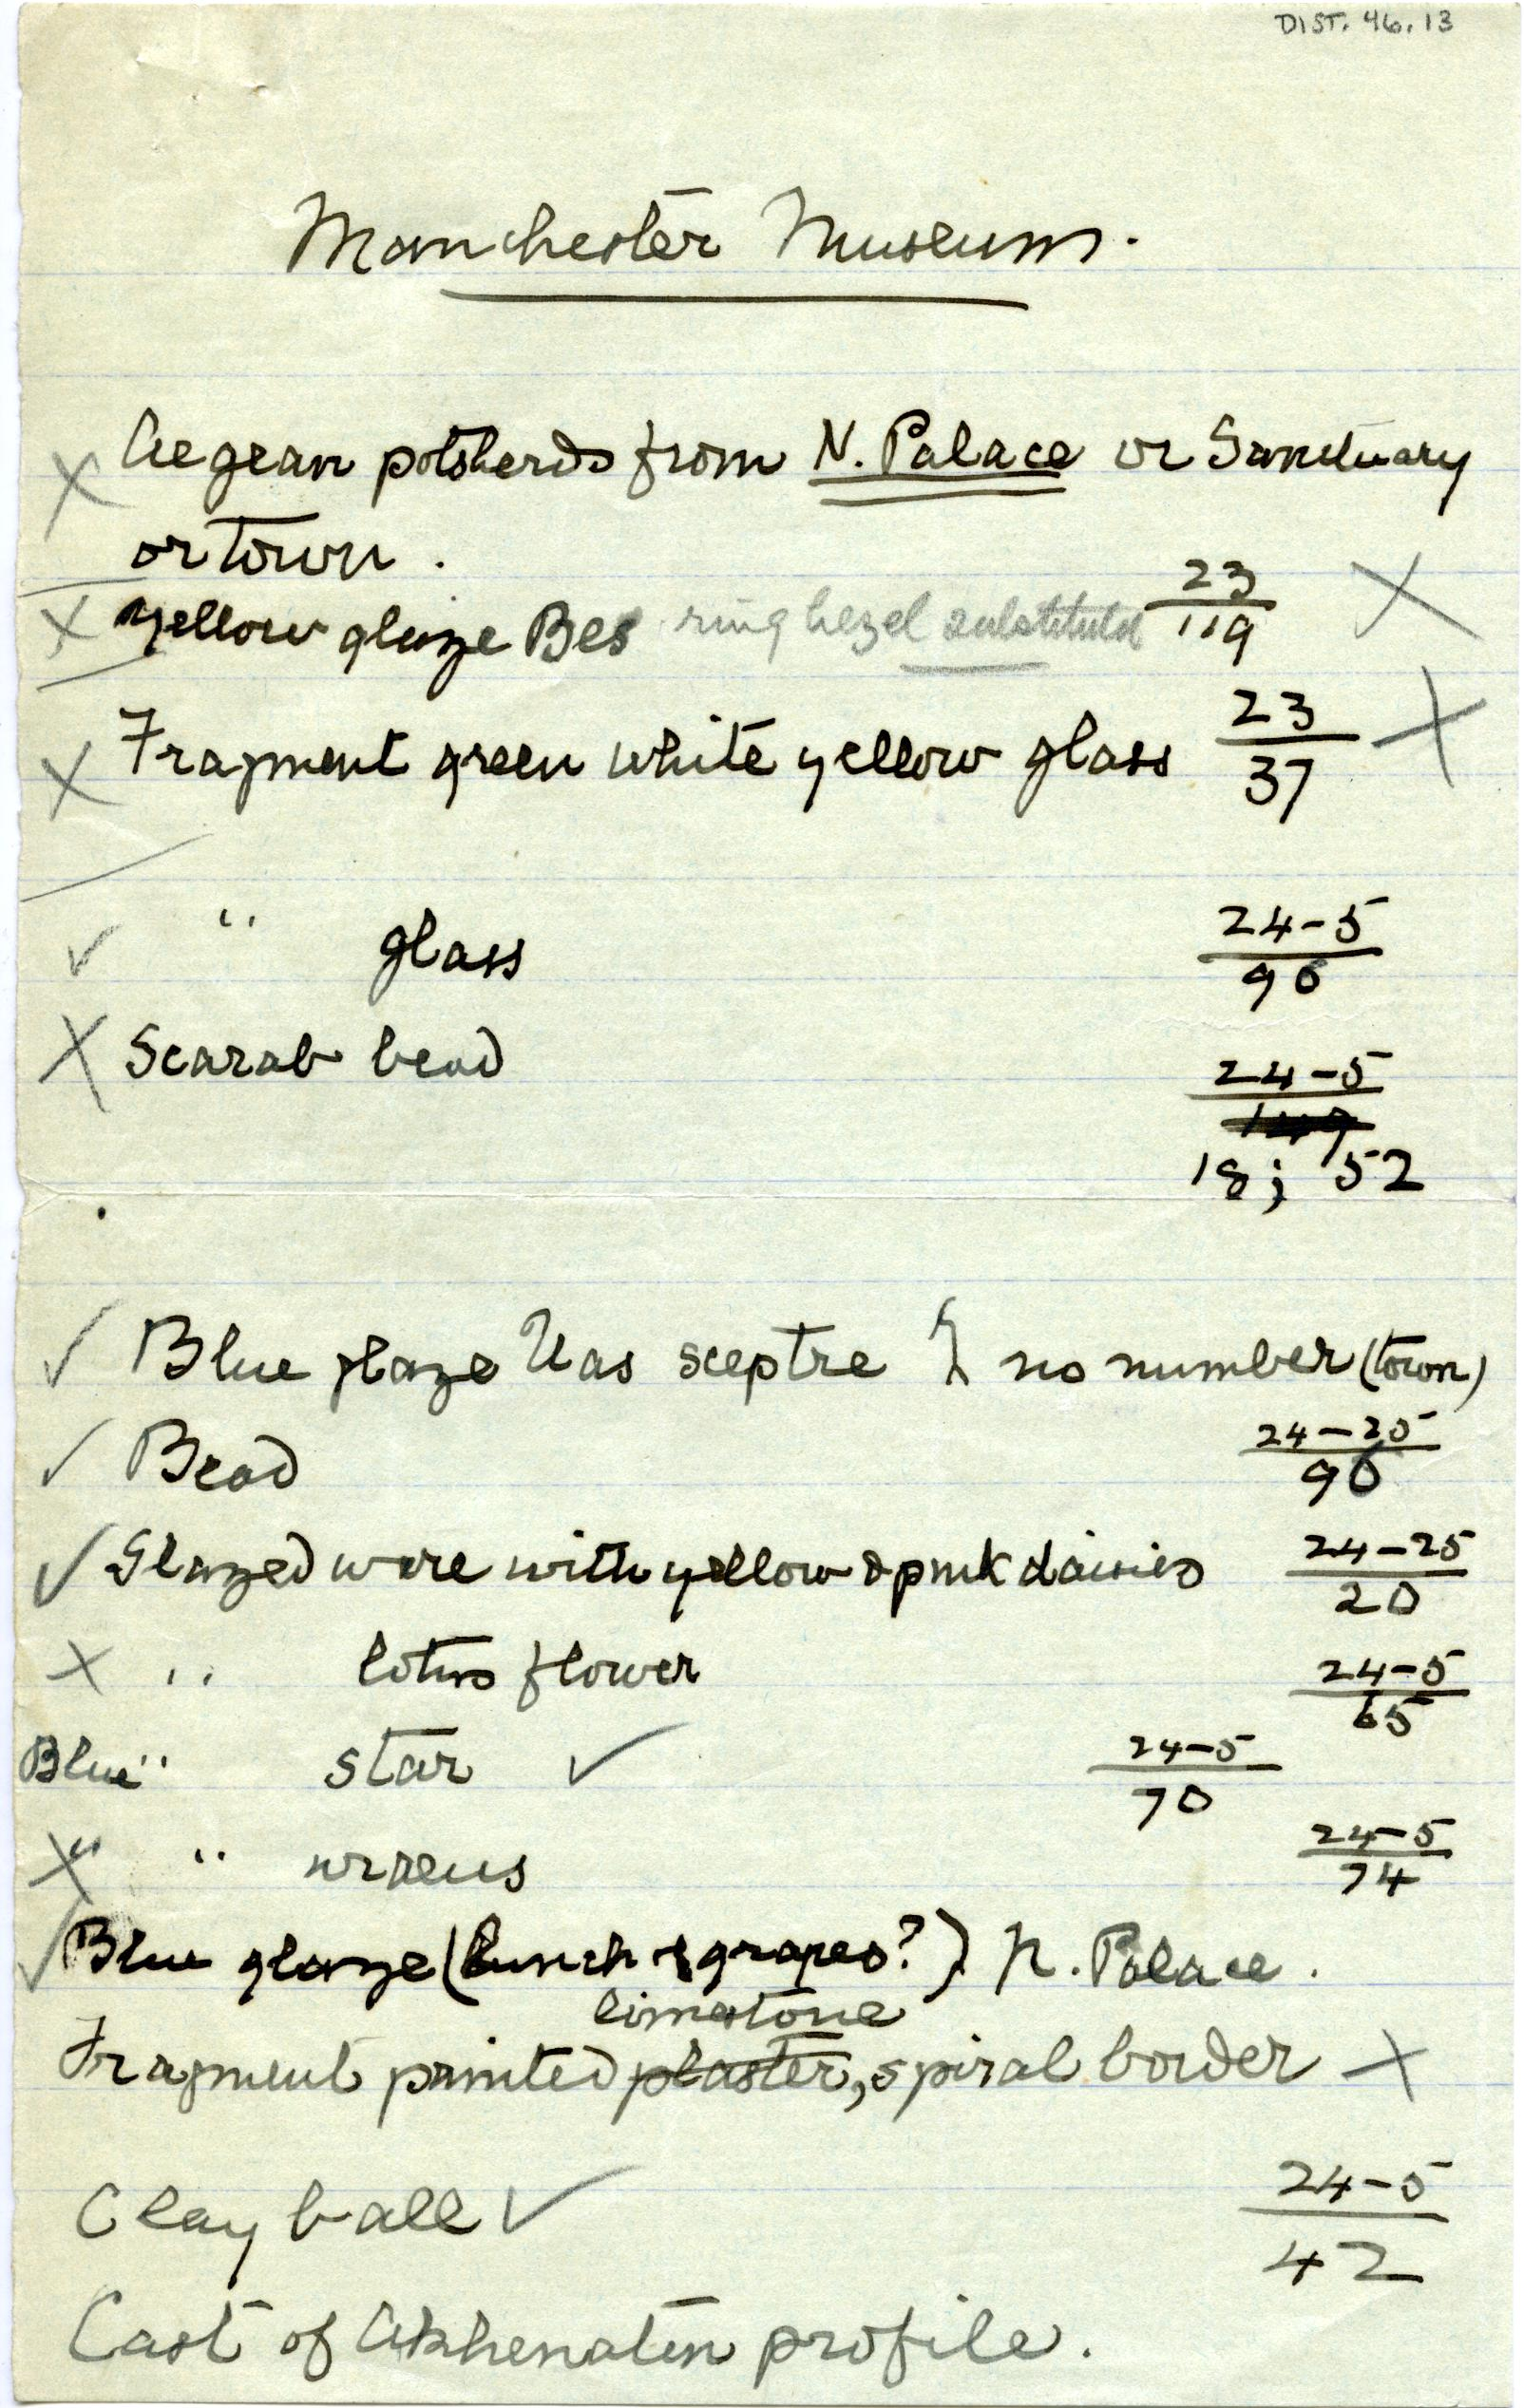 1921-25 el-Amarna DIST.46.13